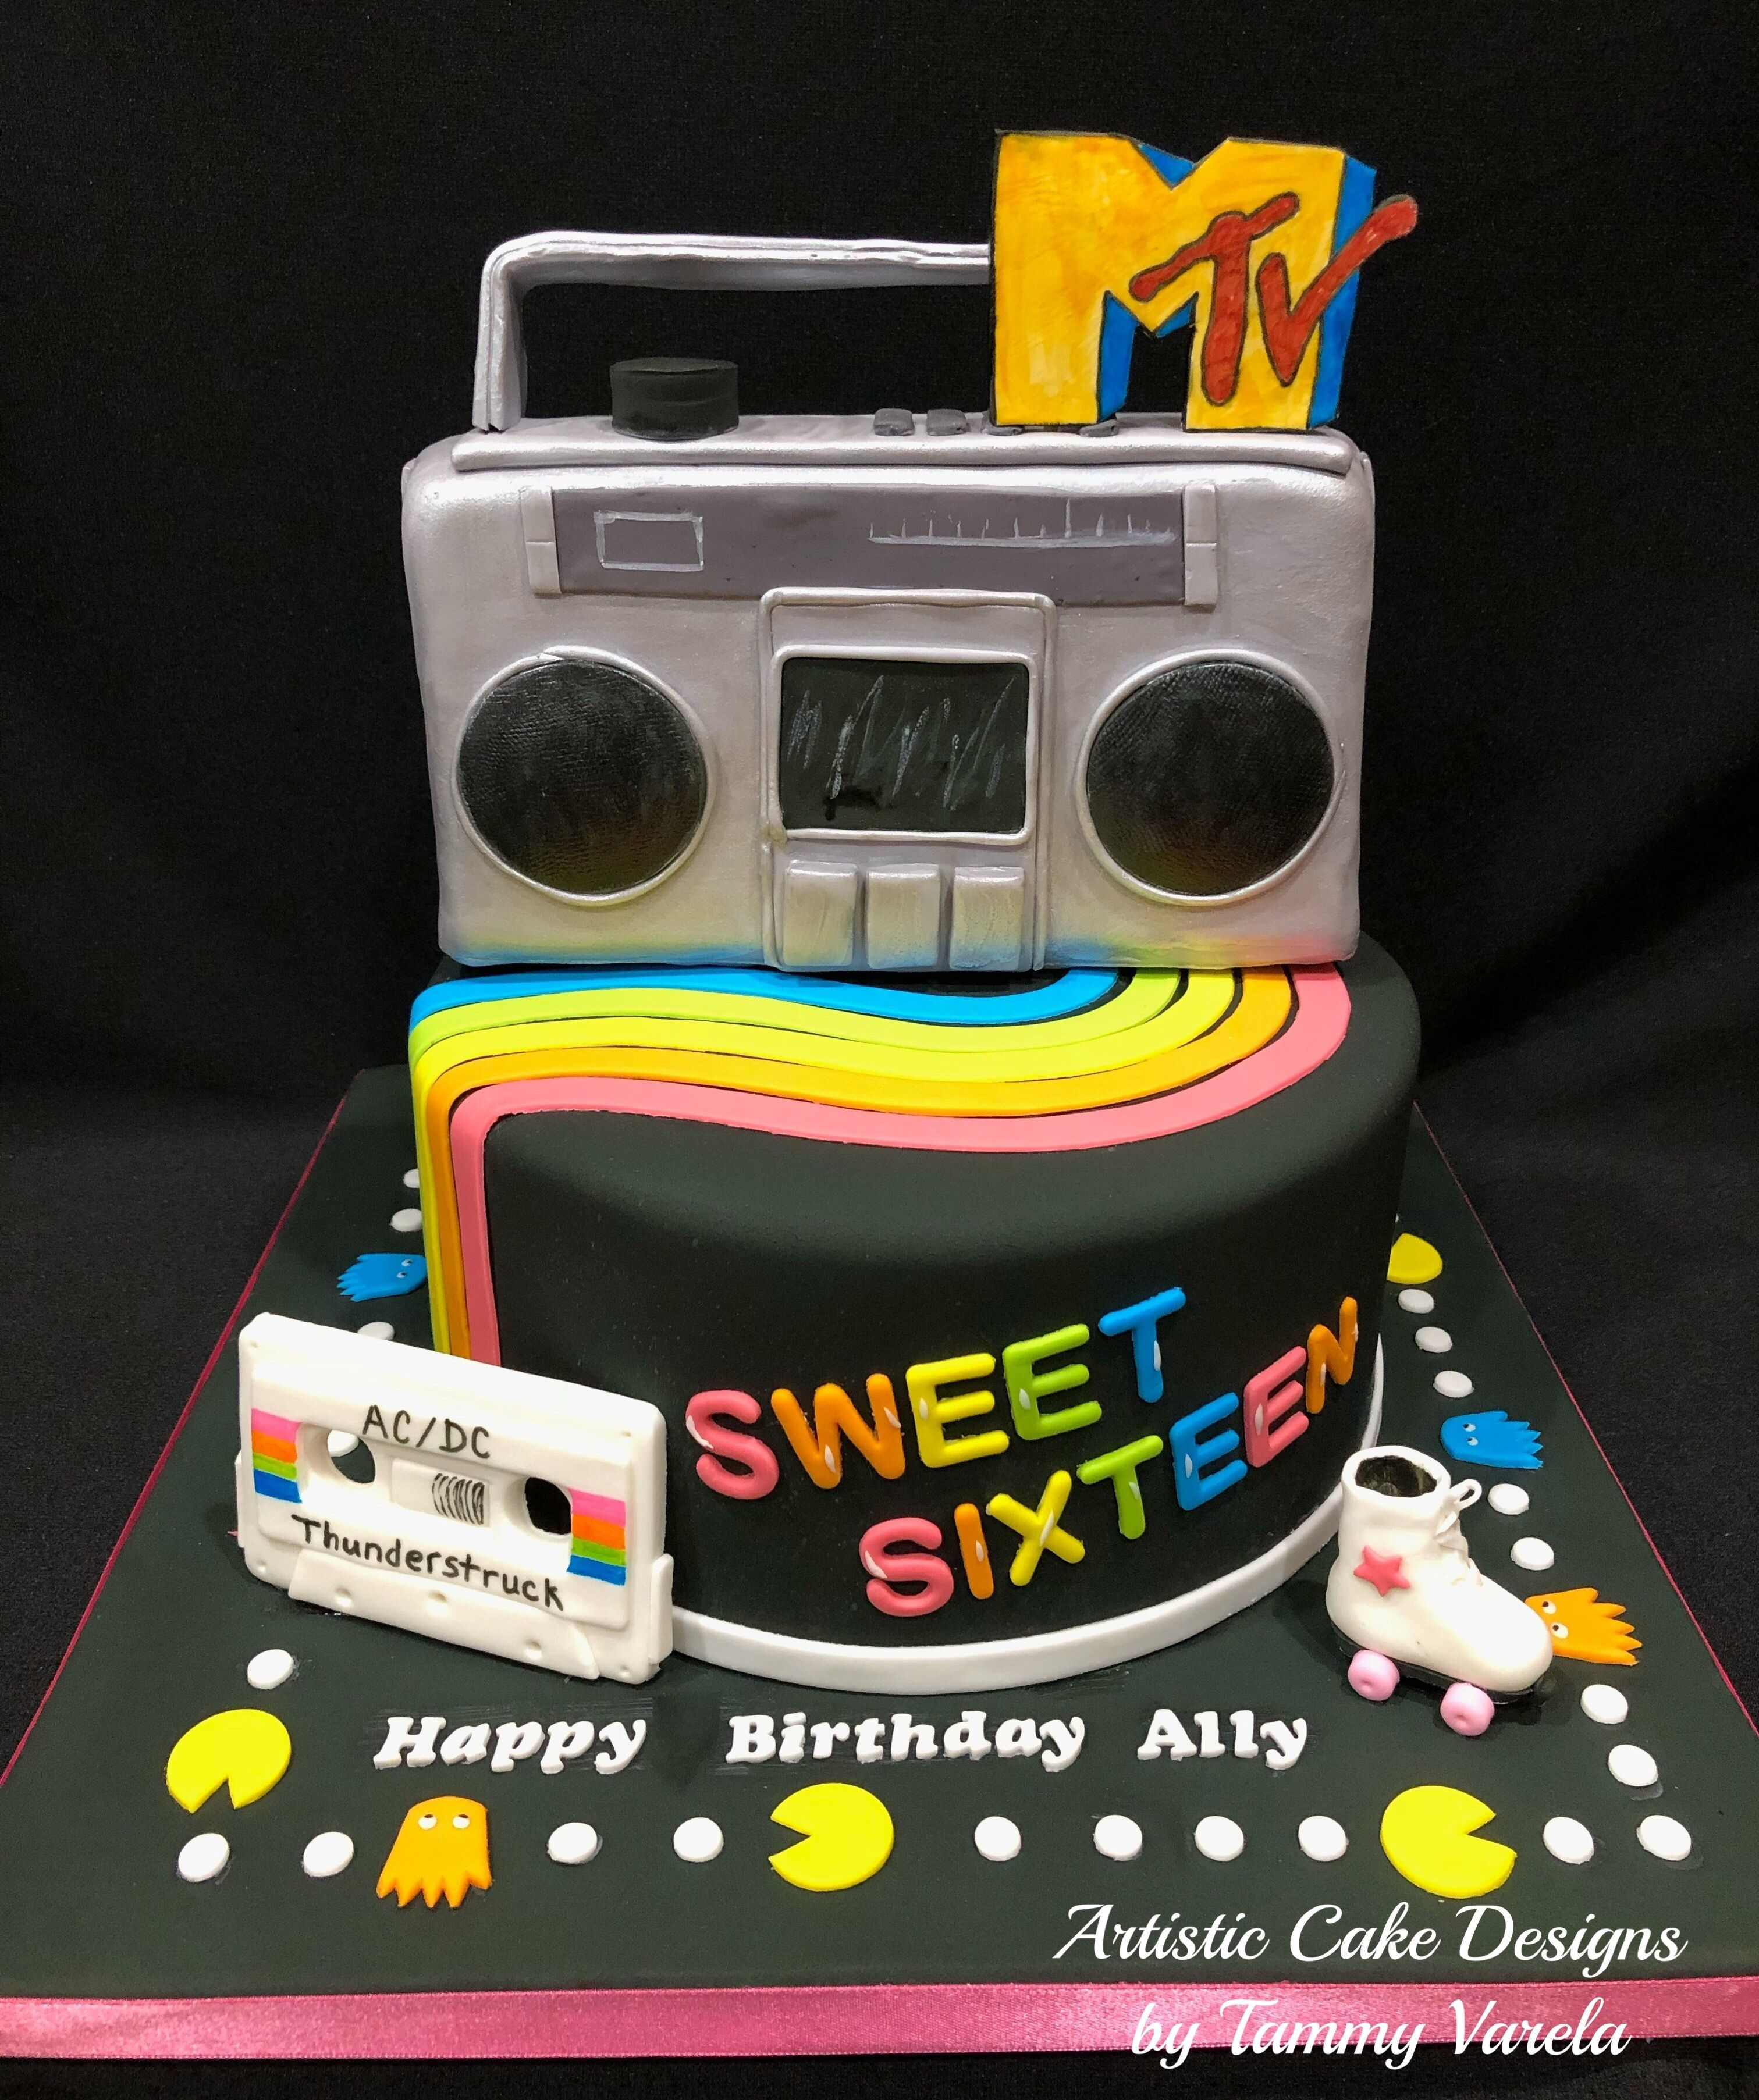 80s Theme Birthday Party Cake Sweet Sixteen Sweetsixteen Sweetsixteenpartyideas Cakedecorating 80sparty